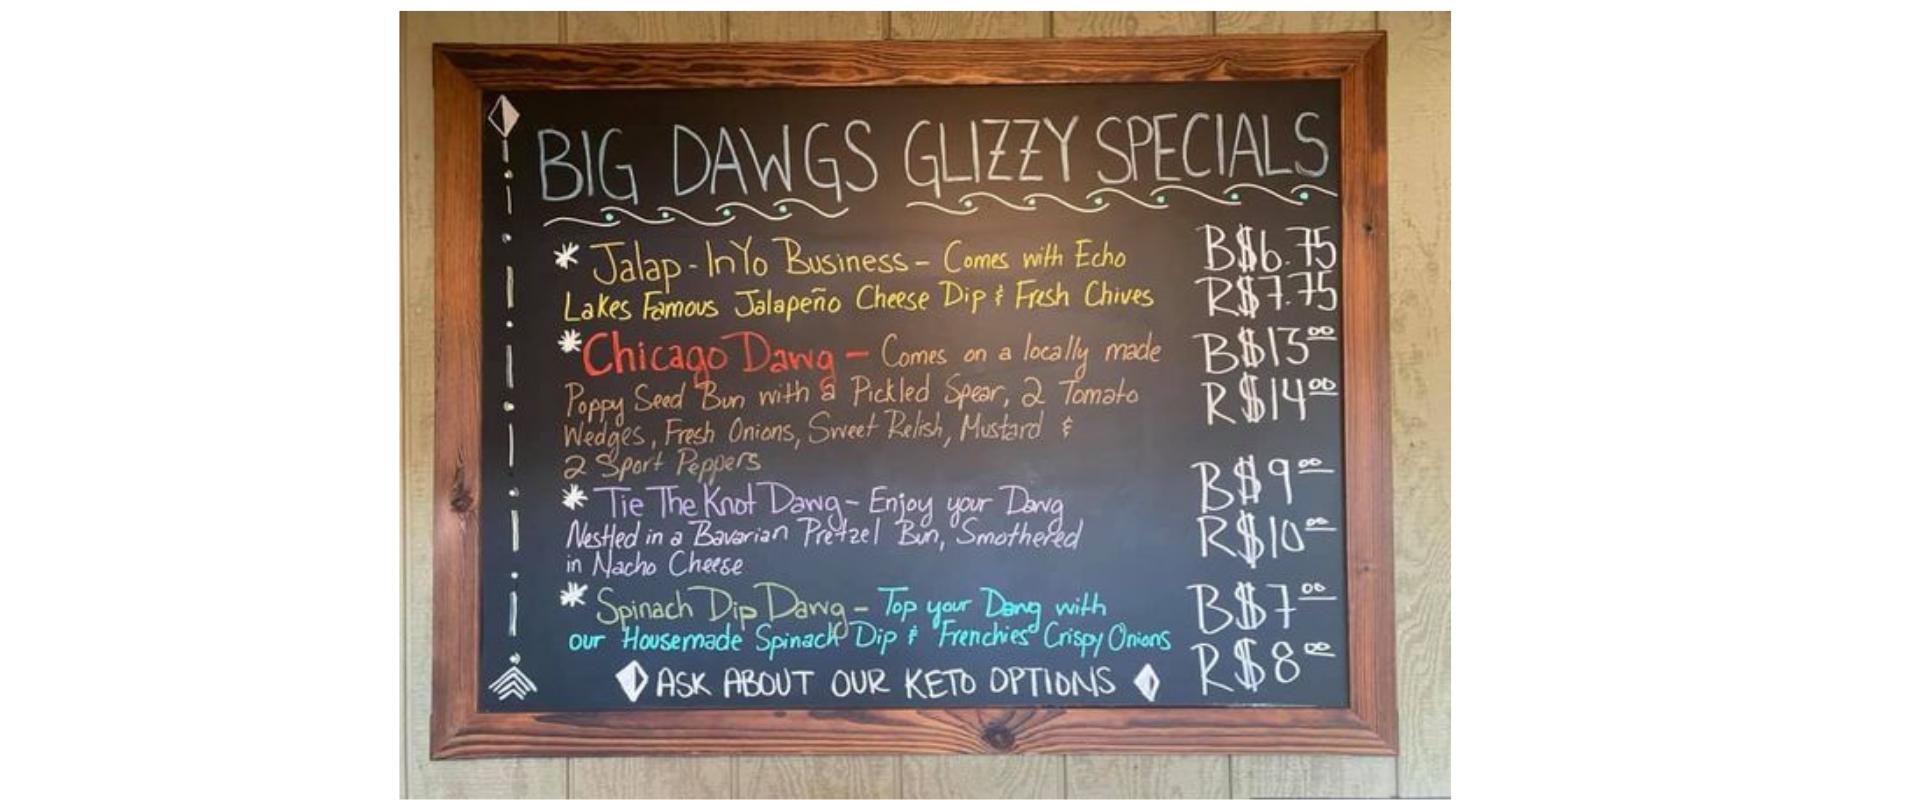 Big Dawgs Hot Dog Stand